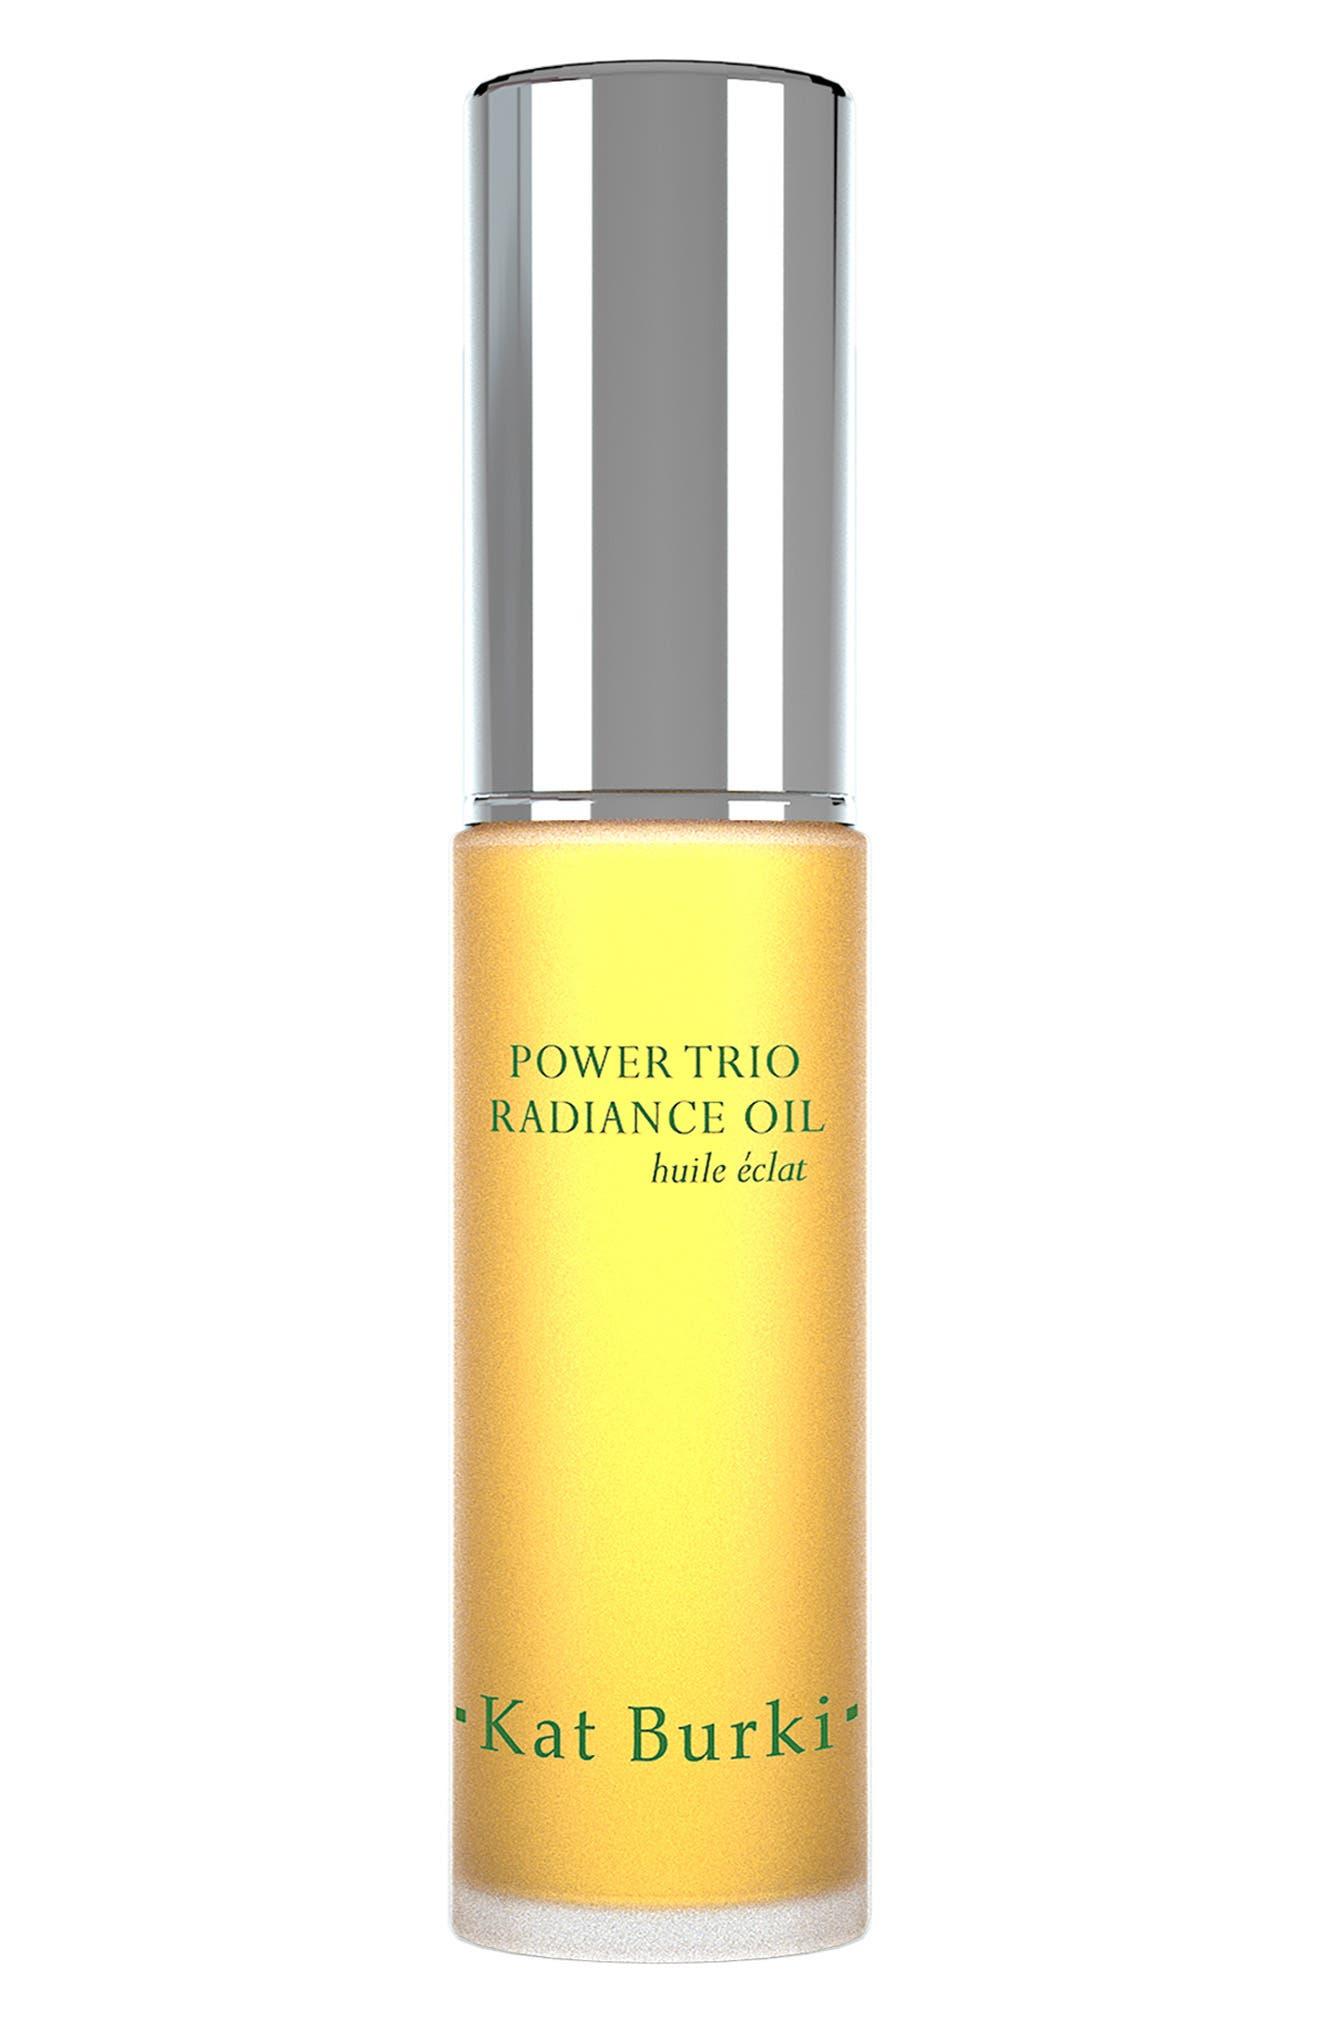 Power Trio Radiance Oil